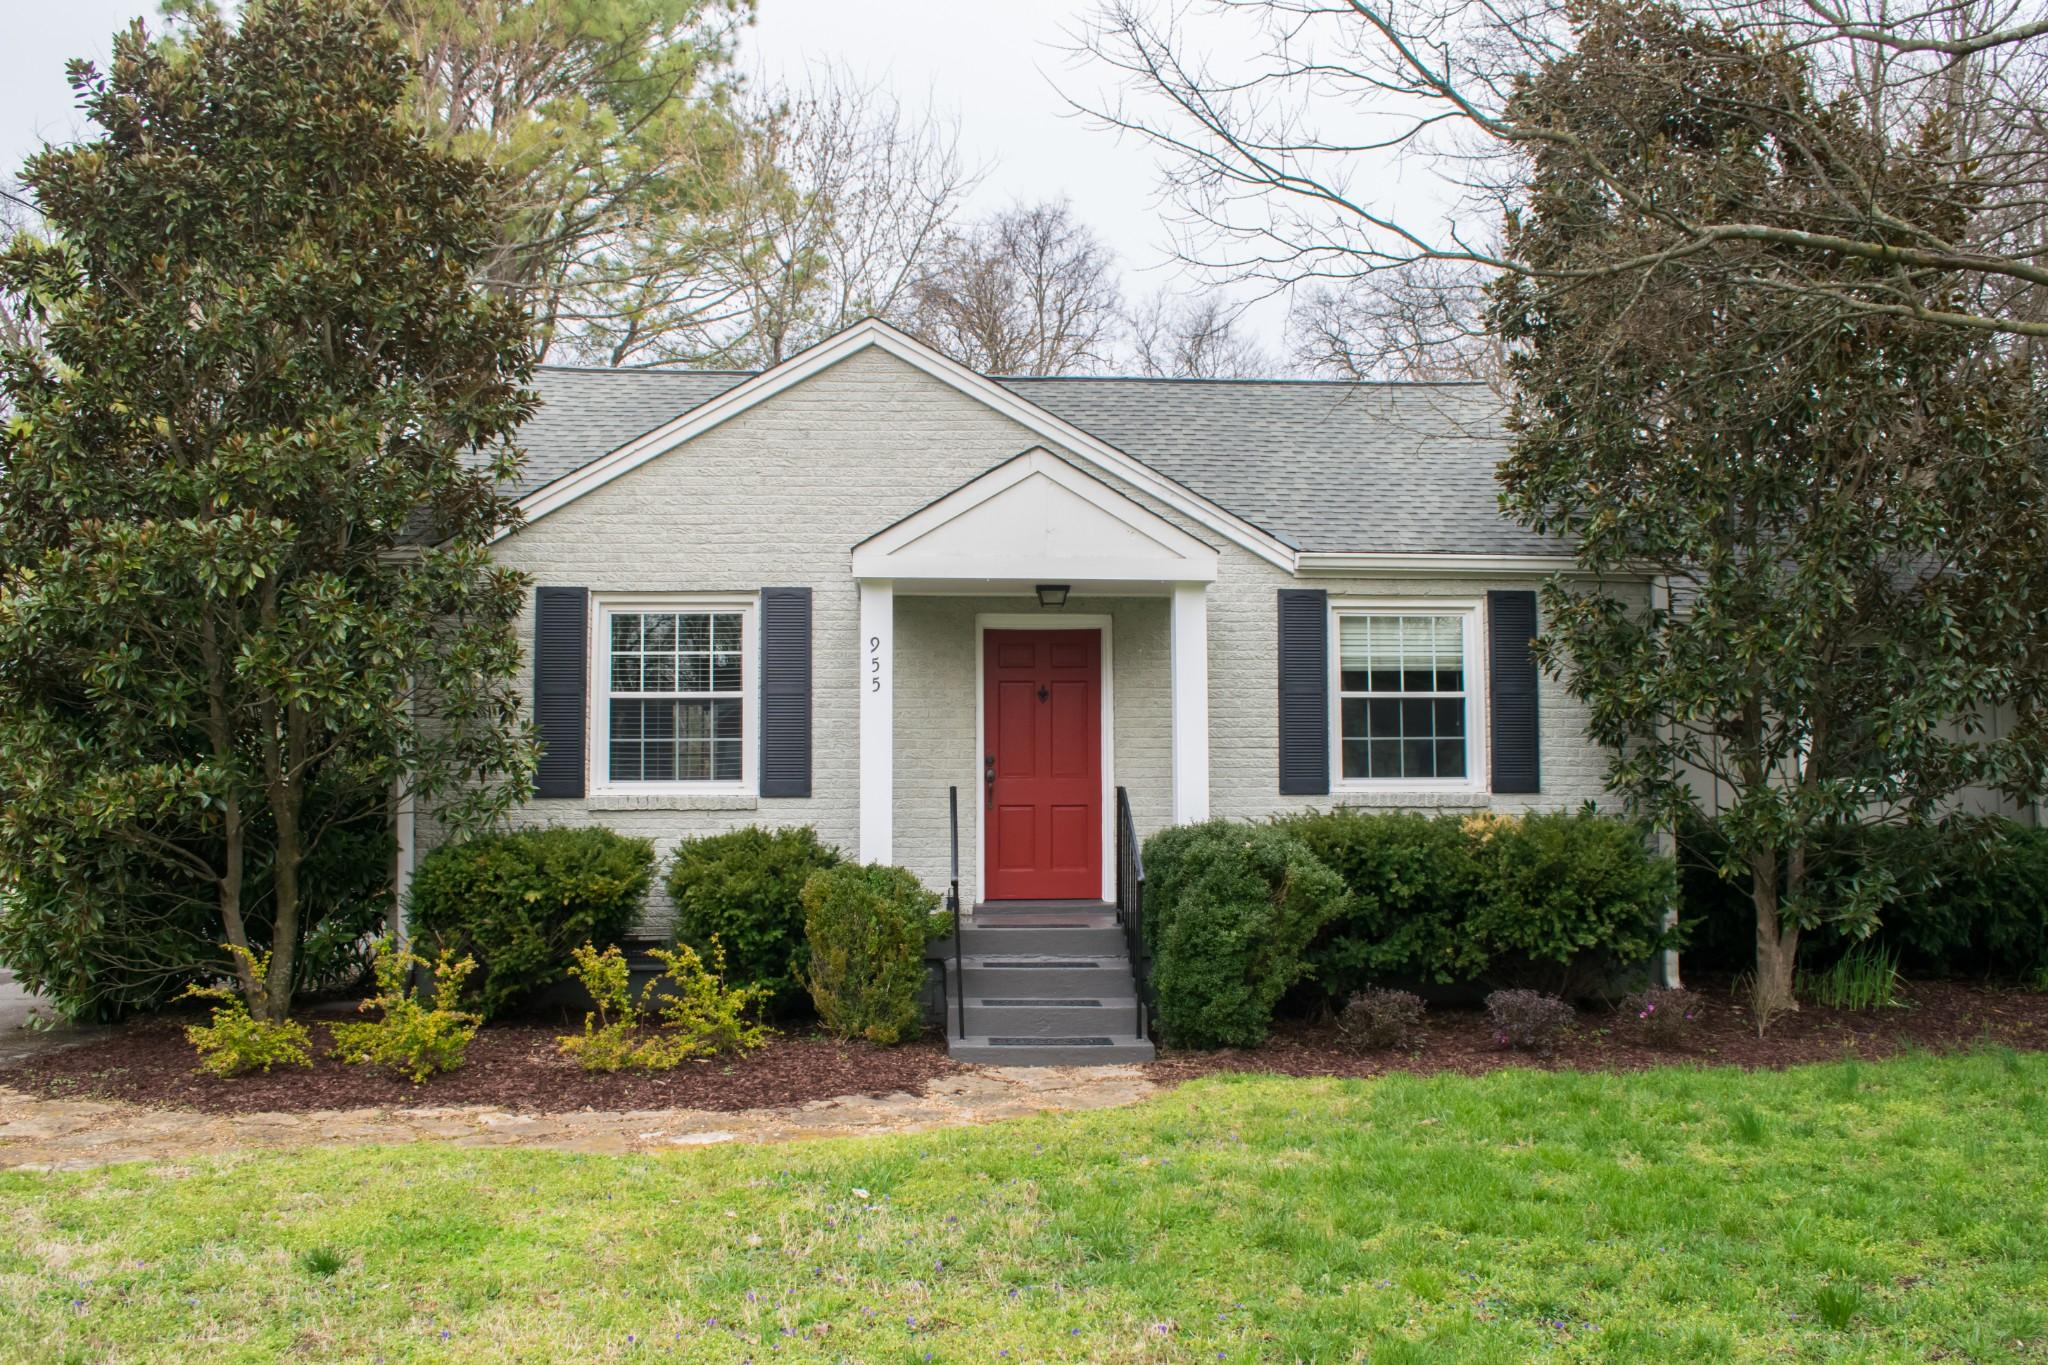 955 Graybar Ln, Nashville, TN 37204 - Nashville, TN real estate listing